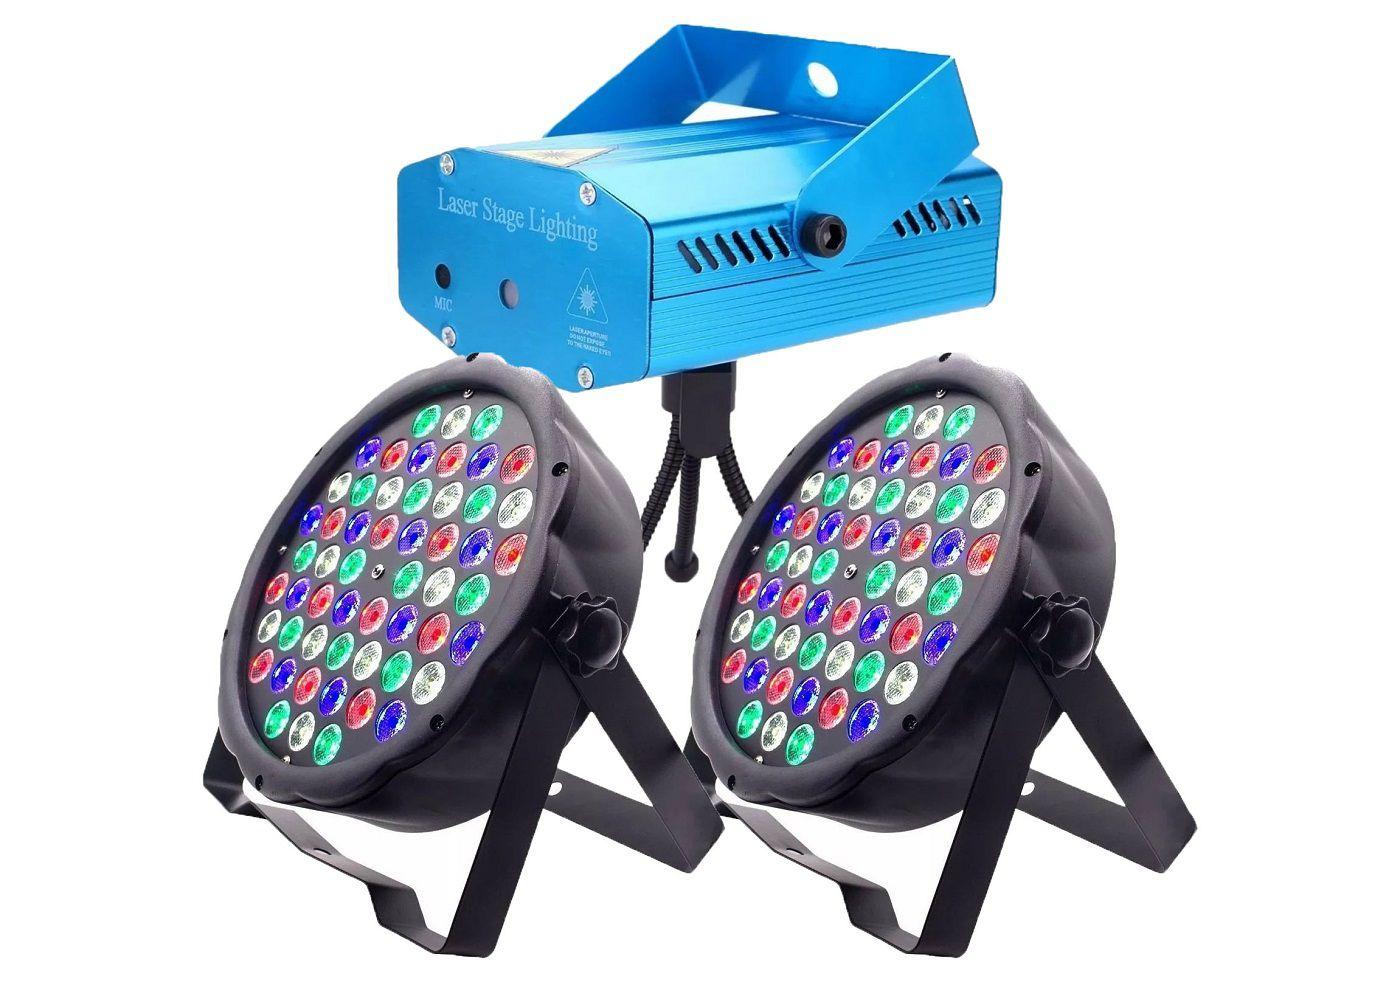 Kit 2x Canhão Luz Par 54 LEDs + Mini Laser Projetor Holográfico - 54LEDSLIM+SD-09